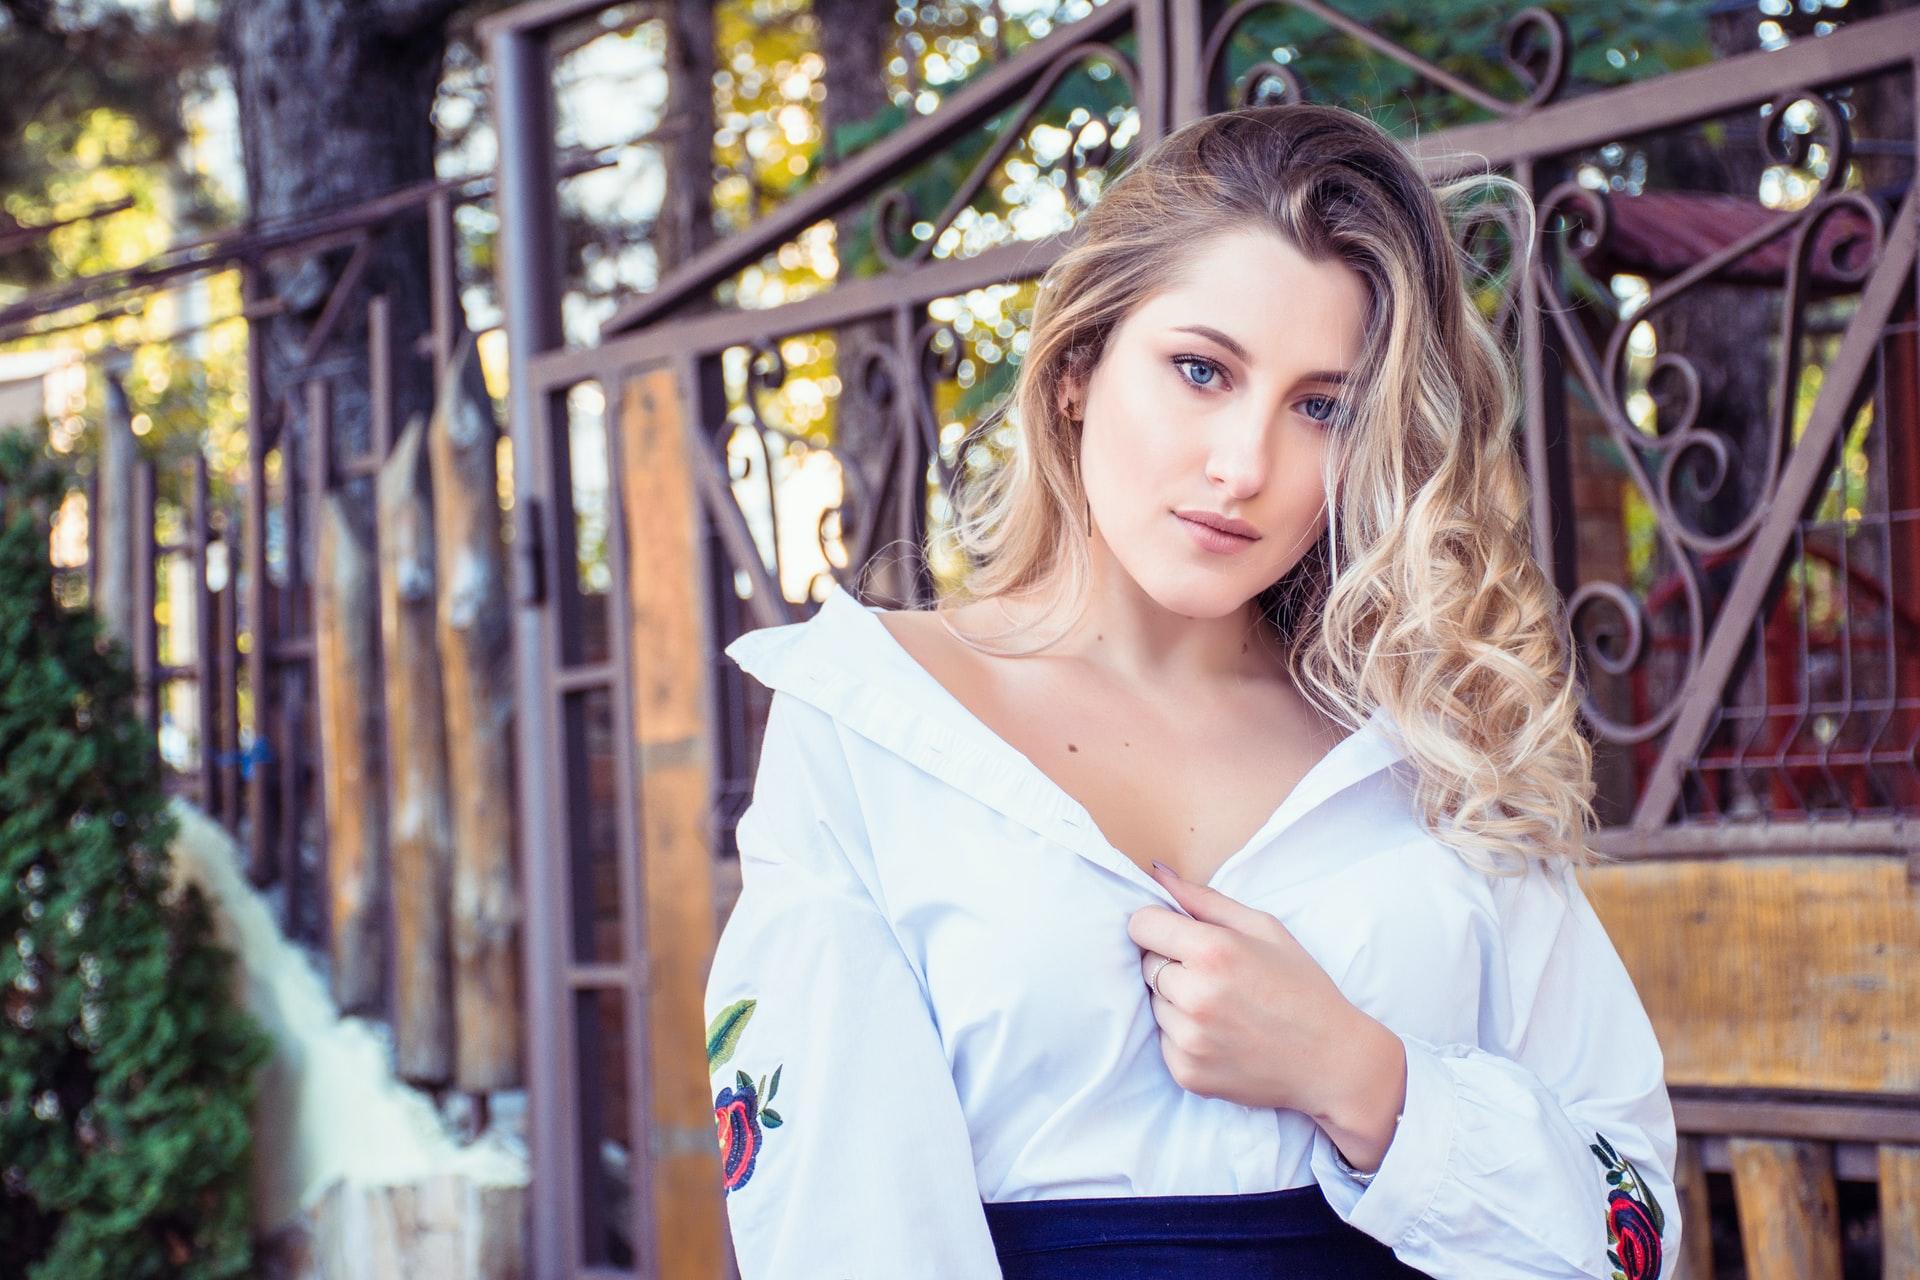 meet Eastern European girls